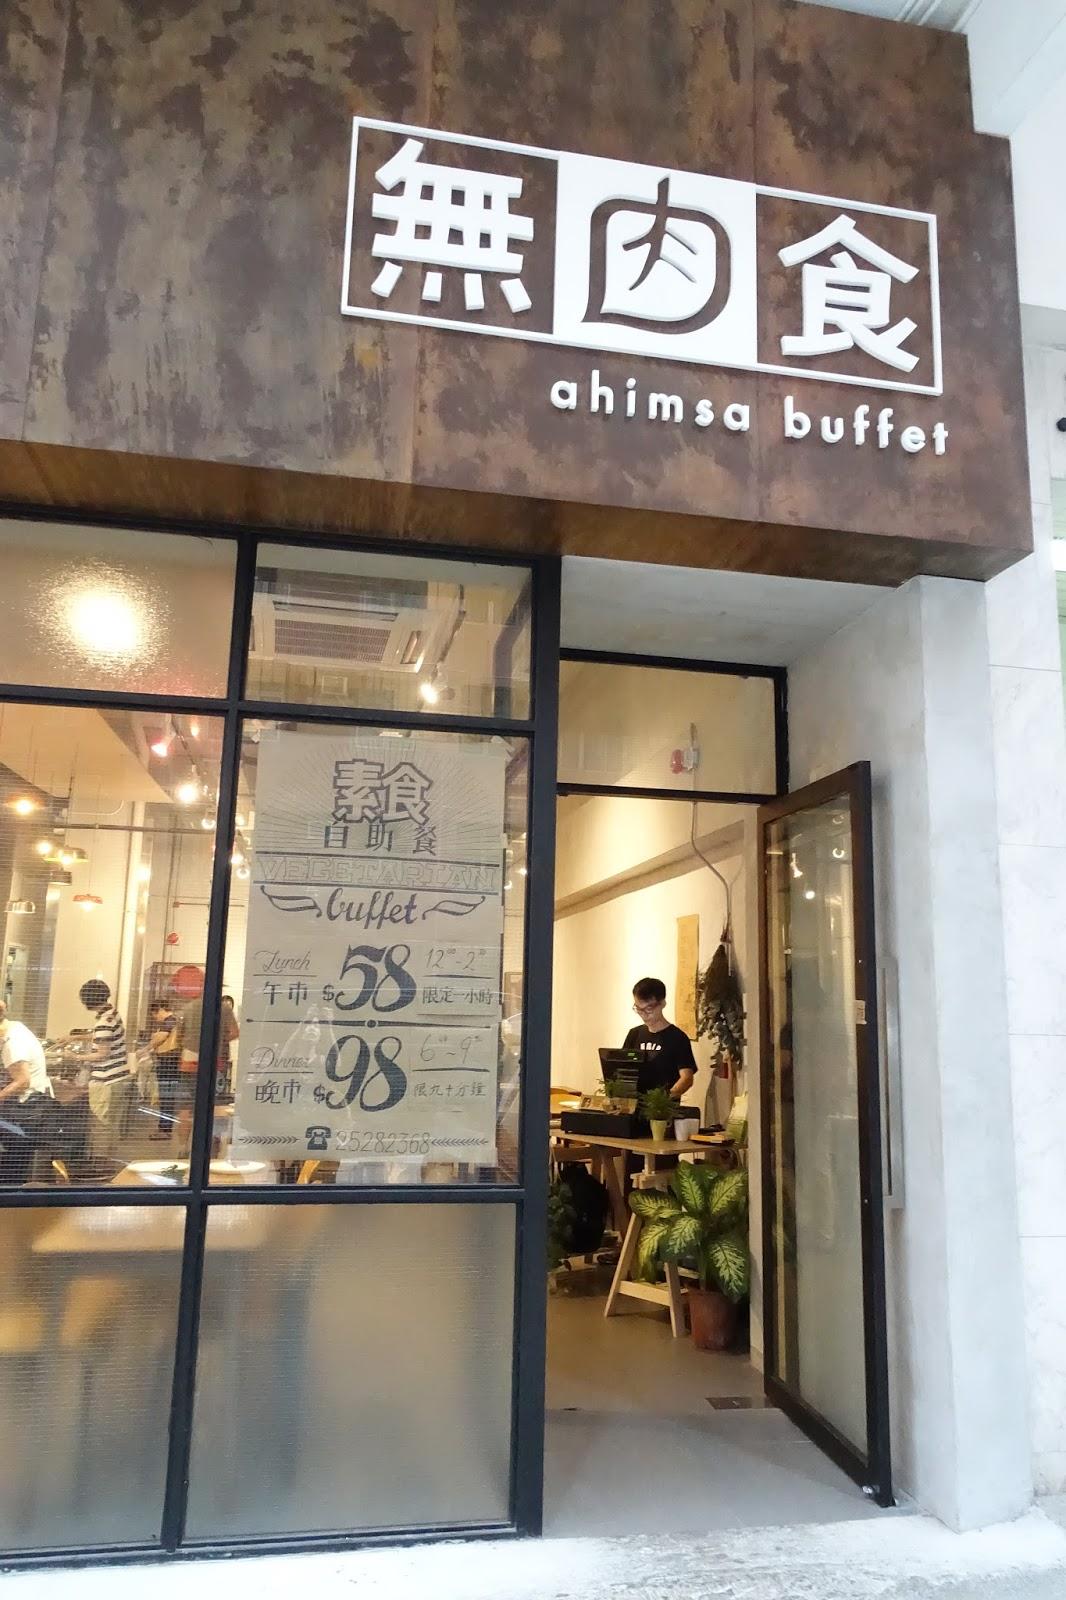 jj......life of an ordinary: 無肉食@北角 - 有賴食客自律自重